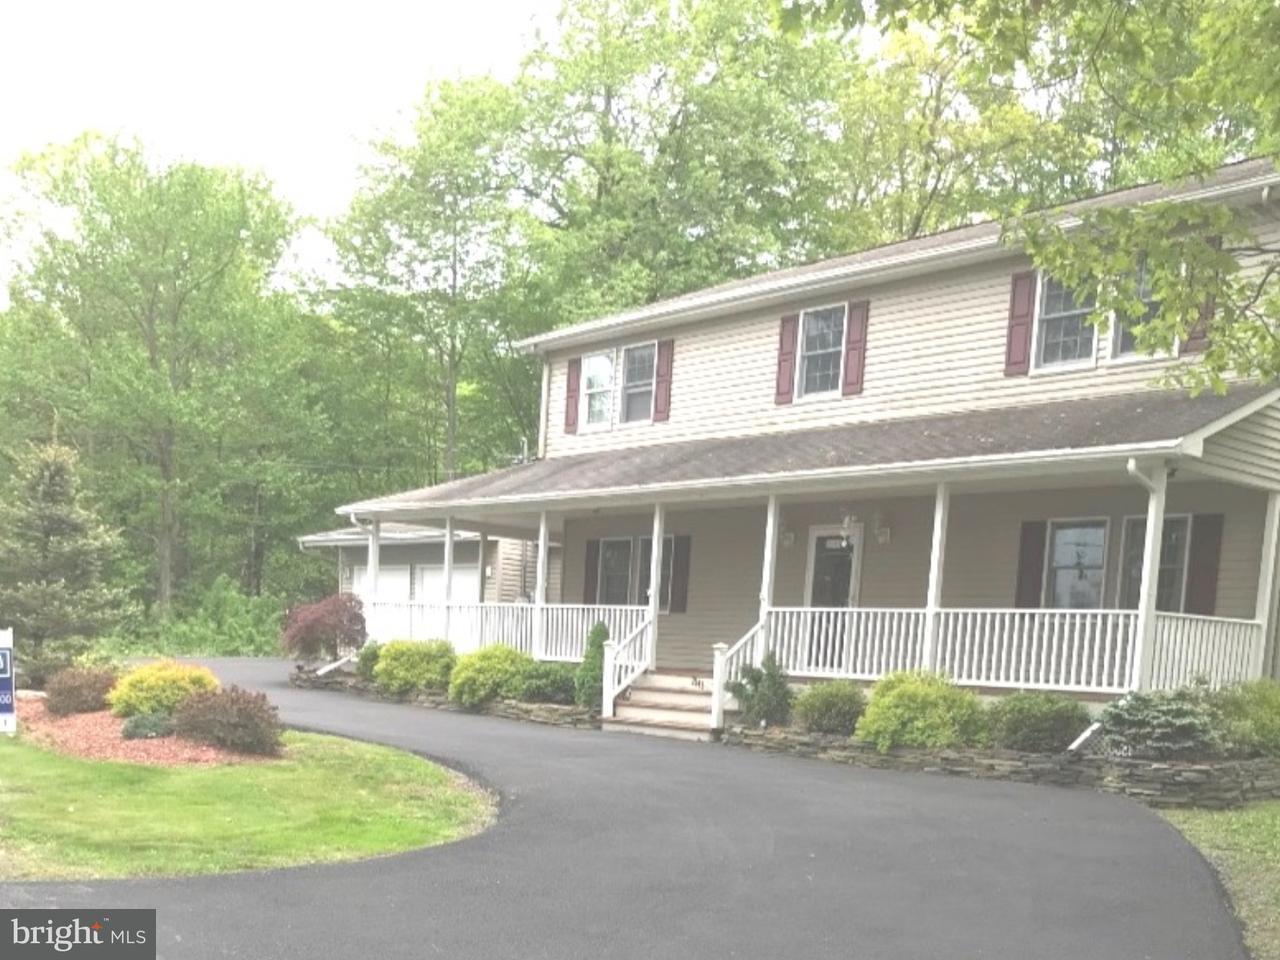 Single Family Home for Sale at 2141 SHORE LINE Drive Pocono Summit, Pennsylvania 18346 United States